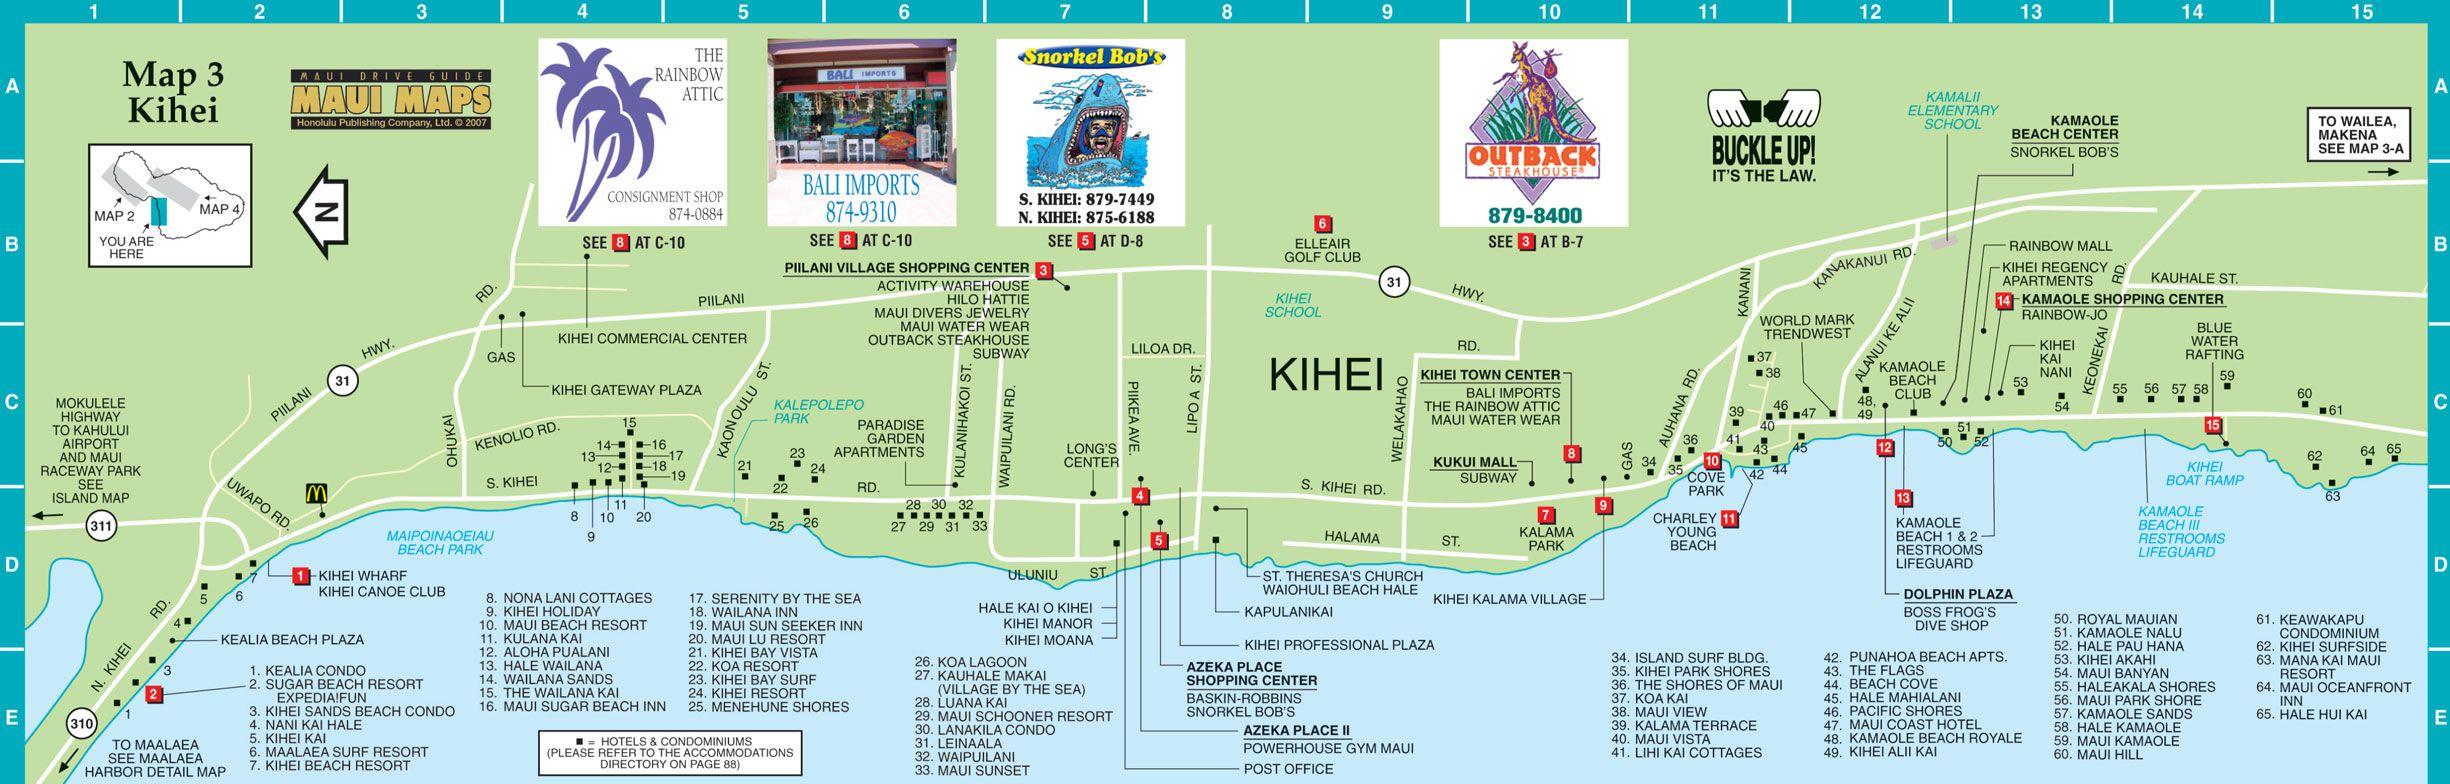 Kauai Tourist Map Of Resorts on tourist map of iceland, tourist map of philadelphia pa, tourist map of vienna austria, tourist map of sri lanka, tourist map of geneva switzerland, tourist map of montego bay, tourist map of hollywood ca, tourist map of athens greece, tourist map of milan italy, tourist map of portofino italy, tourist map of oahu hawaii, tourist map of brussels belgium, tourist map of scotland uk, tourist map of st thomas, tourist map of istanbul turkey, tourist map of downtown seattle, tourist map of french quarter, tourist map of midtown manhattan, tourist map of florence italy, tourist map of monte carlo,